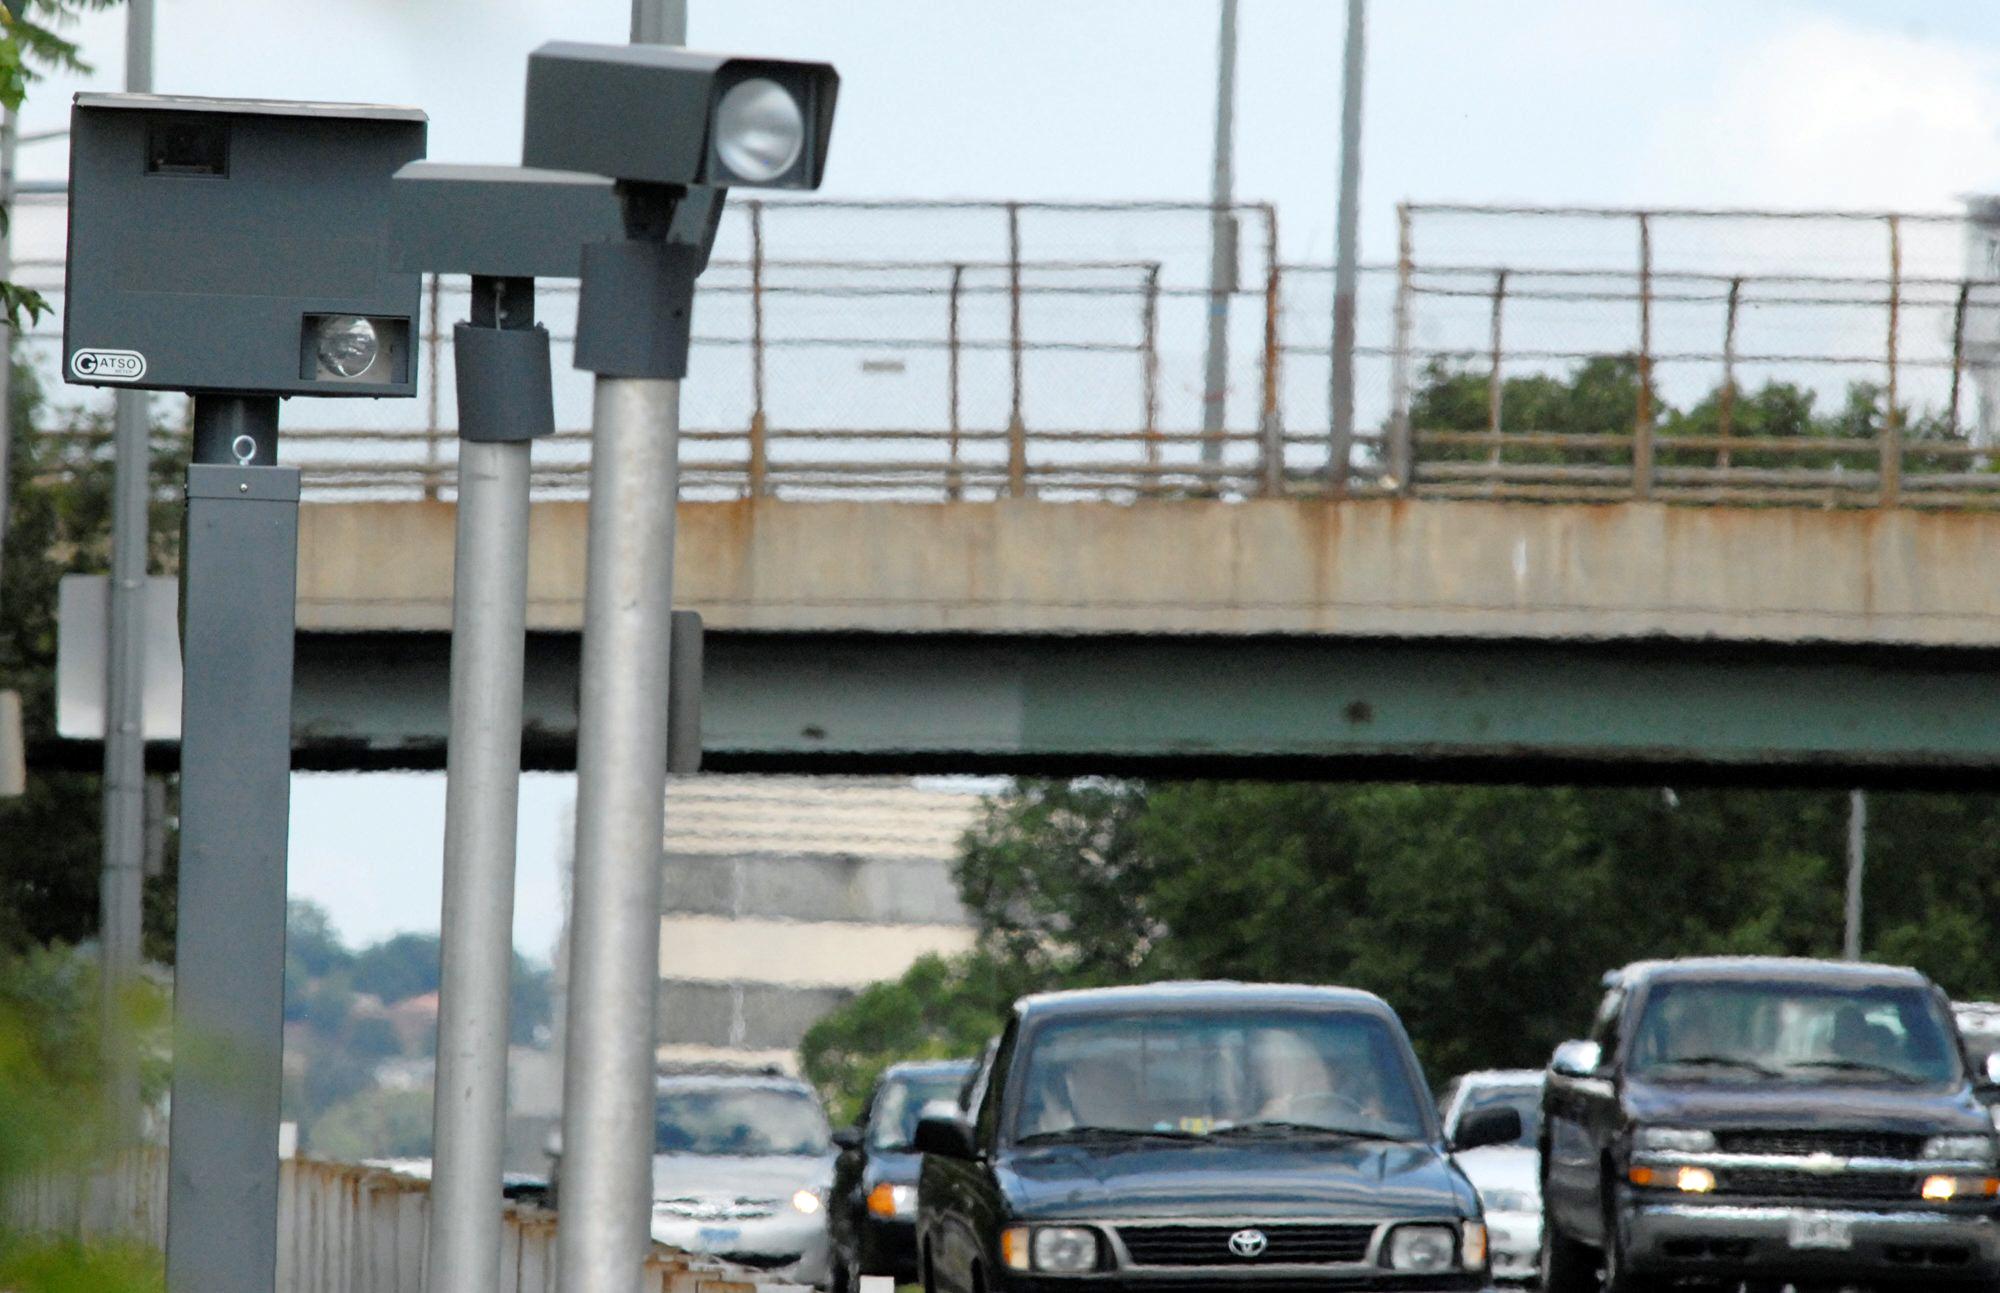 Camera Maryland Highway Cameras problems found in maryland work zone speed cameras washington times